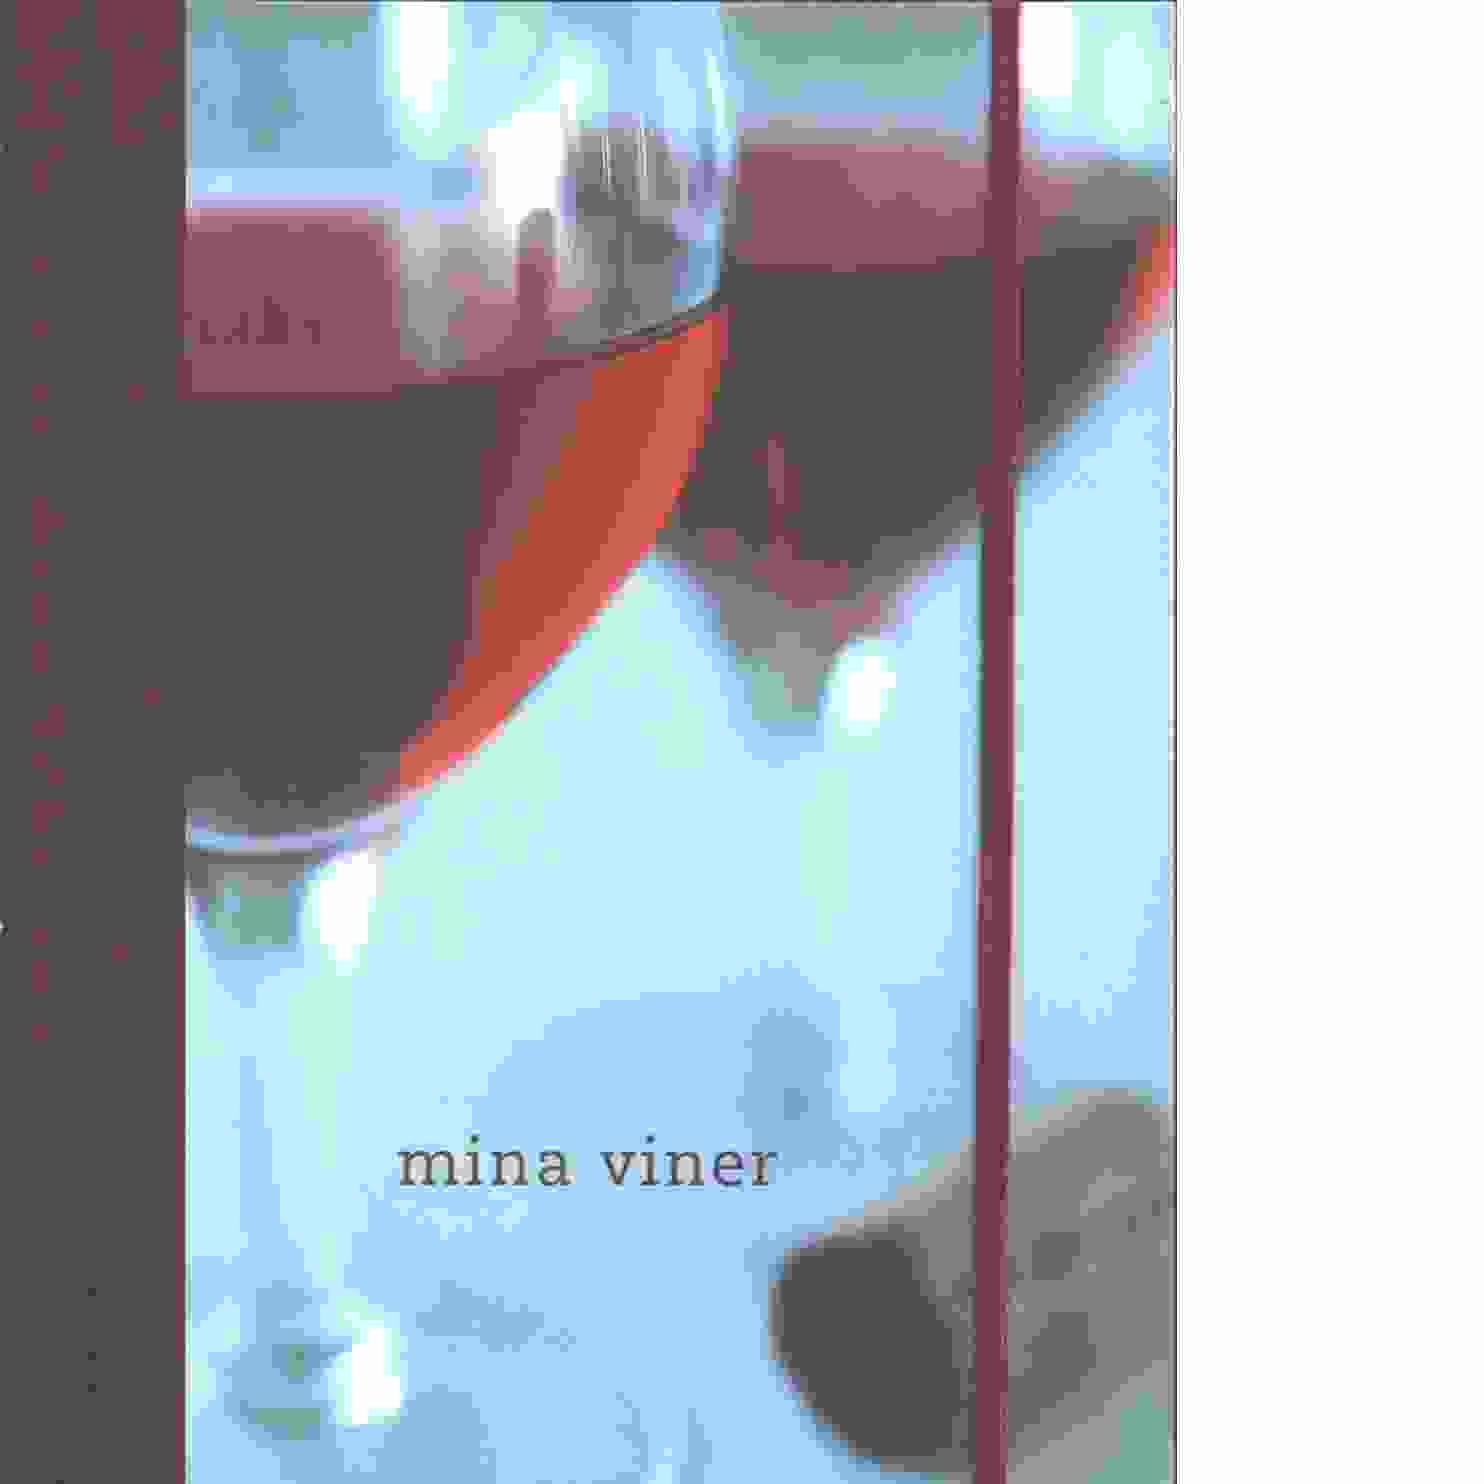 Mina viner - Croft, Nicolle och Jefford, Andrew samt Ray, Jonathan Ray, Jonathan